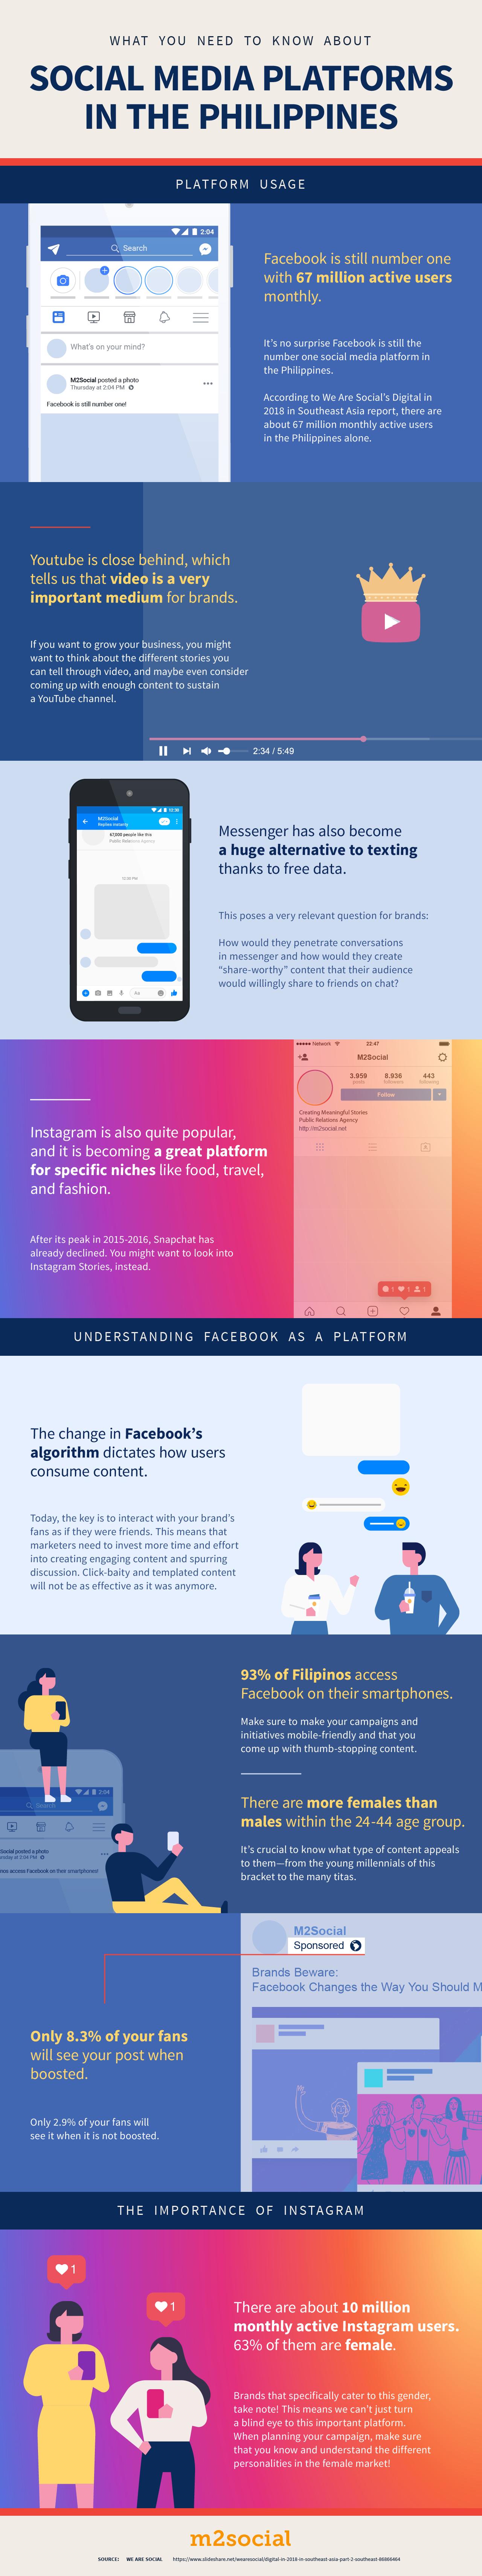 SocialMediaPlatformsPH2018.png